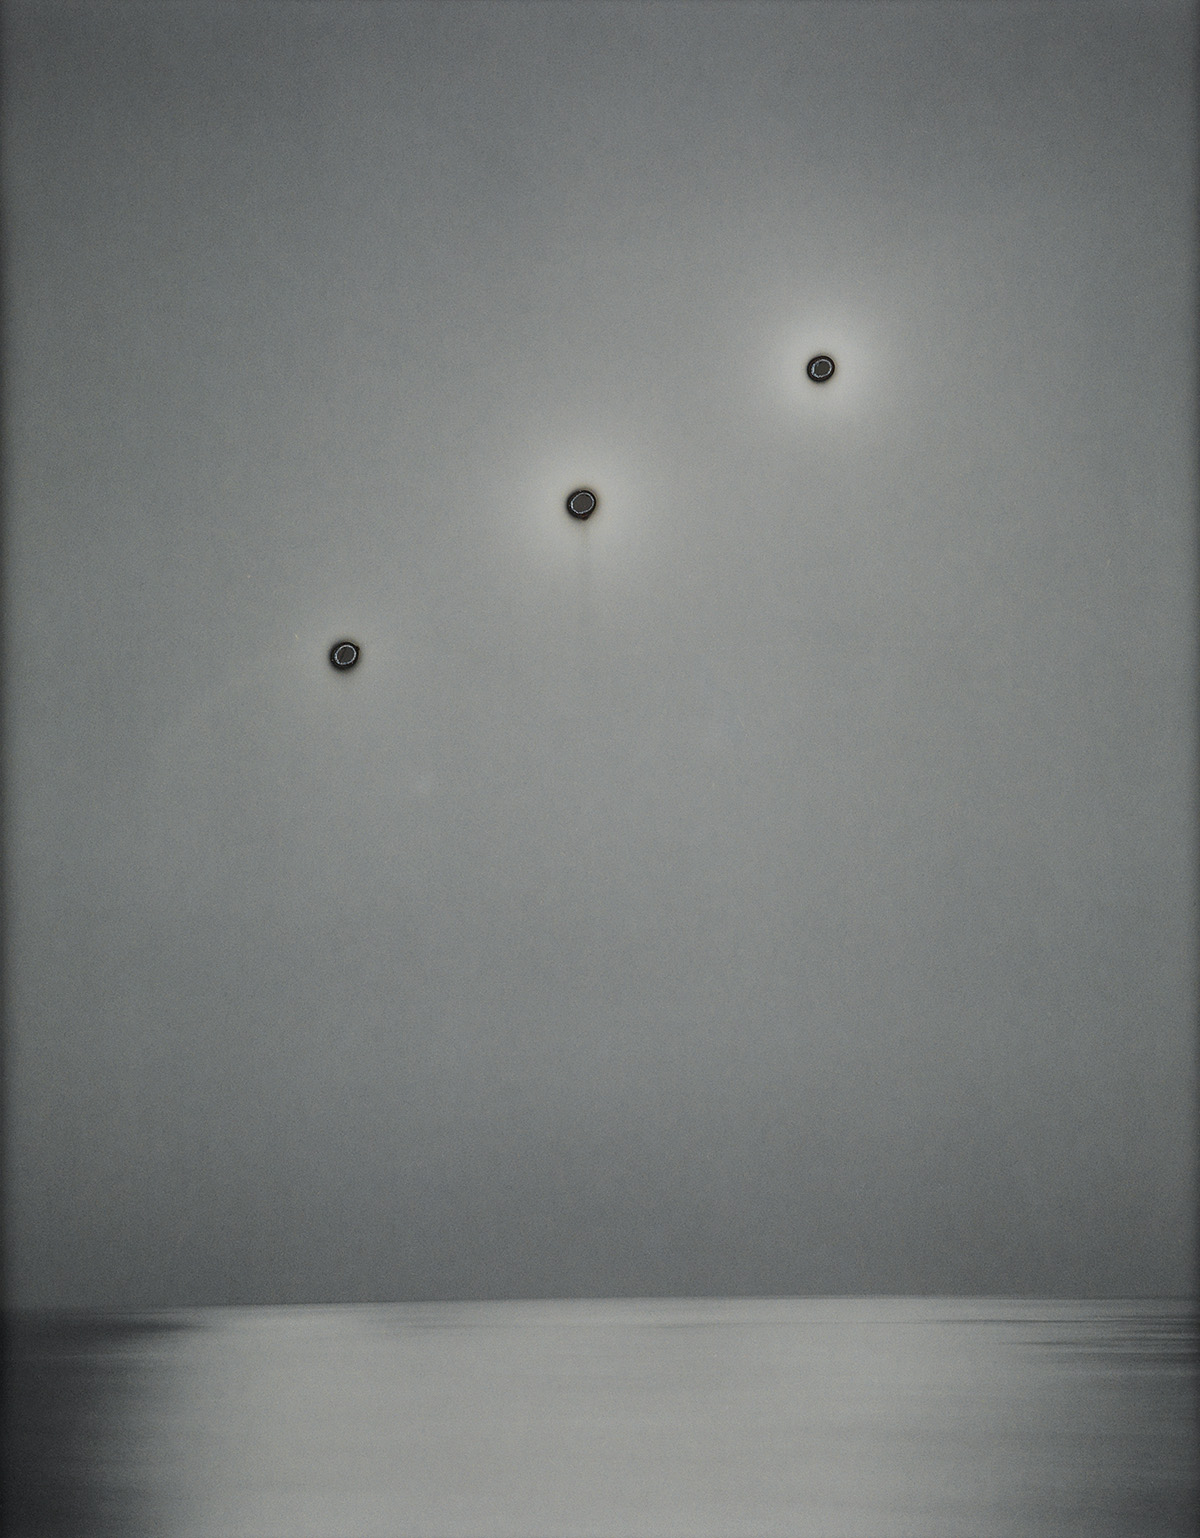 CHRIS MCCAW (1971- ) Sunburn GSP #320 (Pacific Ocean/every 30 minutes).